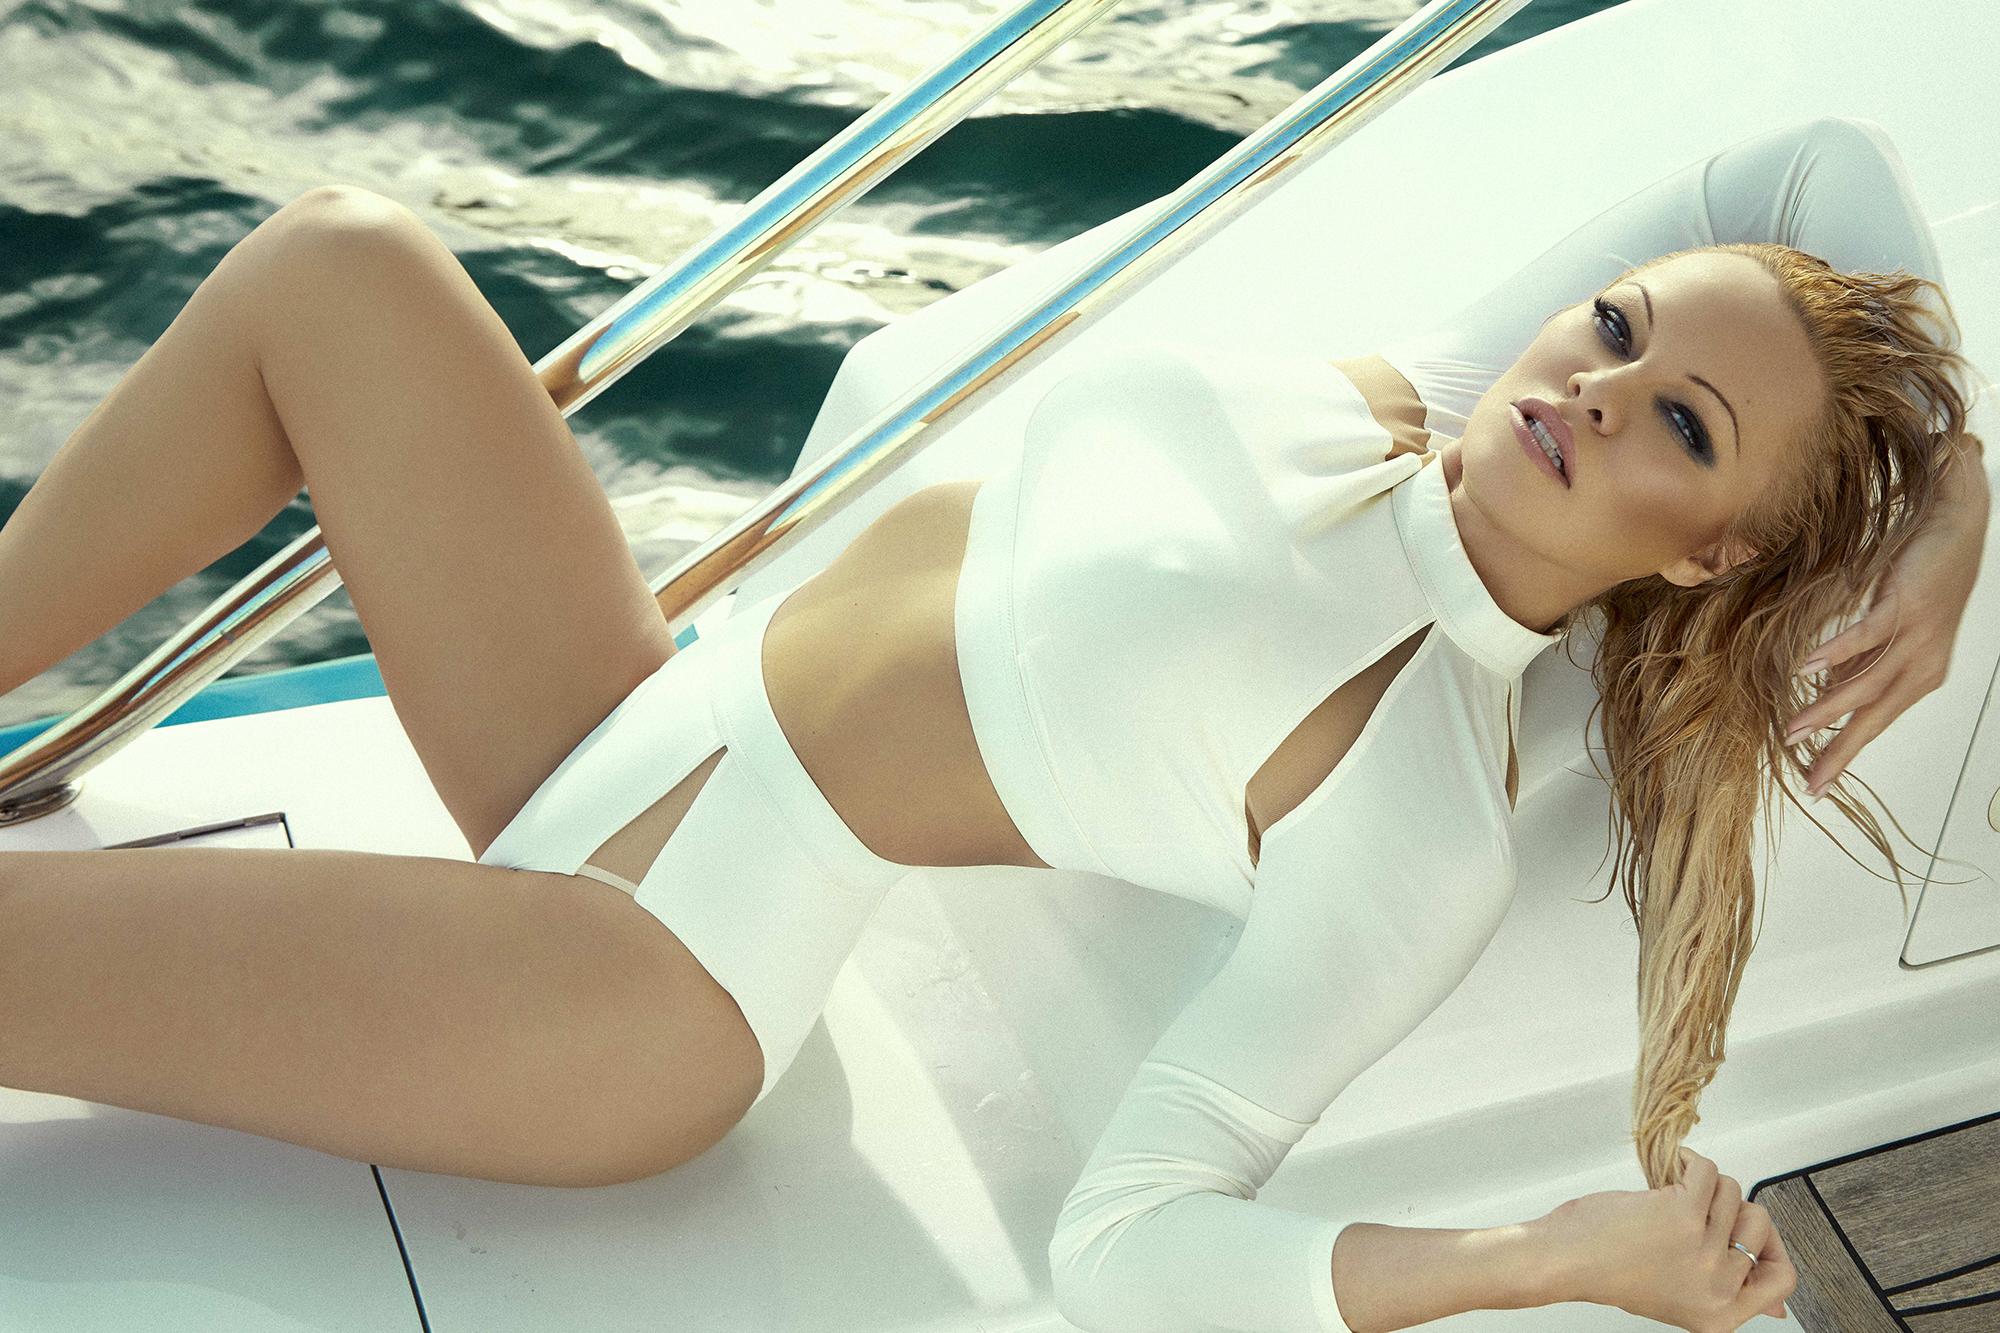 Pamela Anderson Free Video photo 19